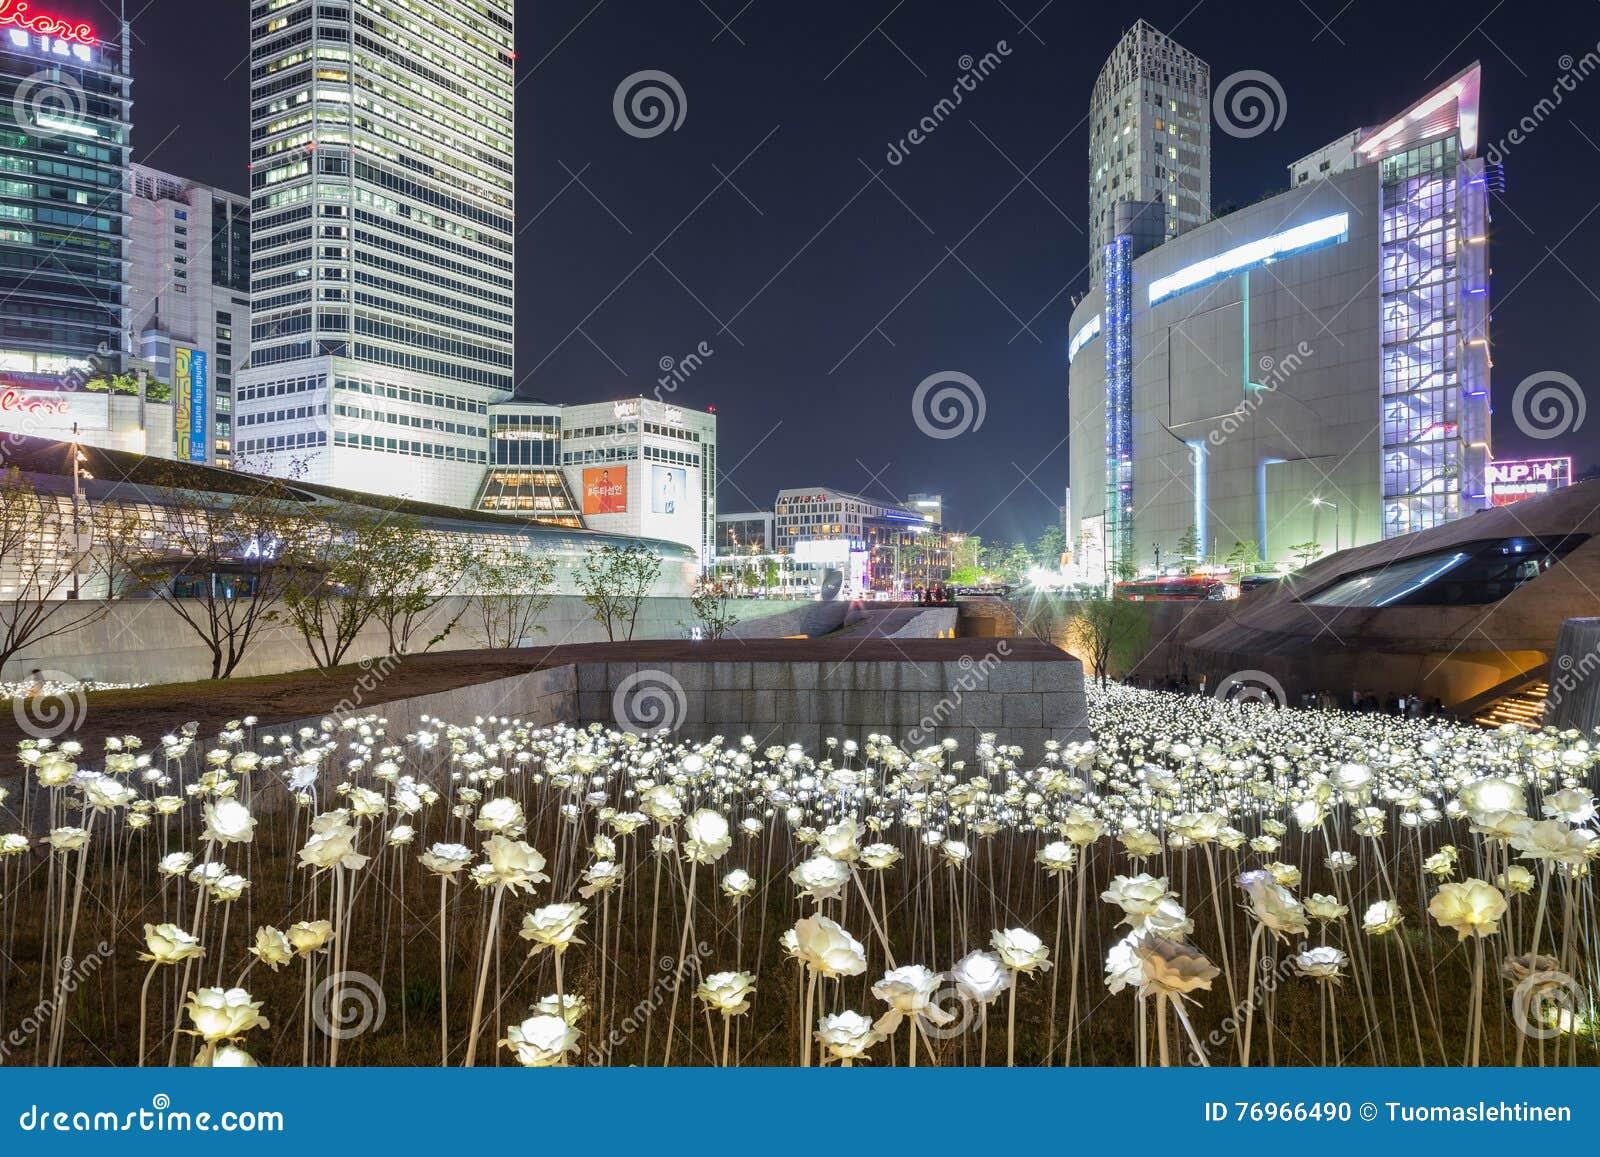 sky rose garden seoul